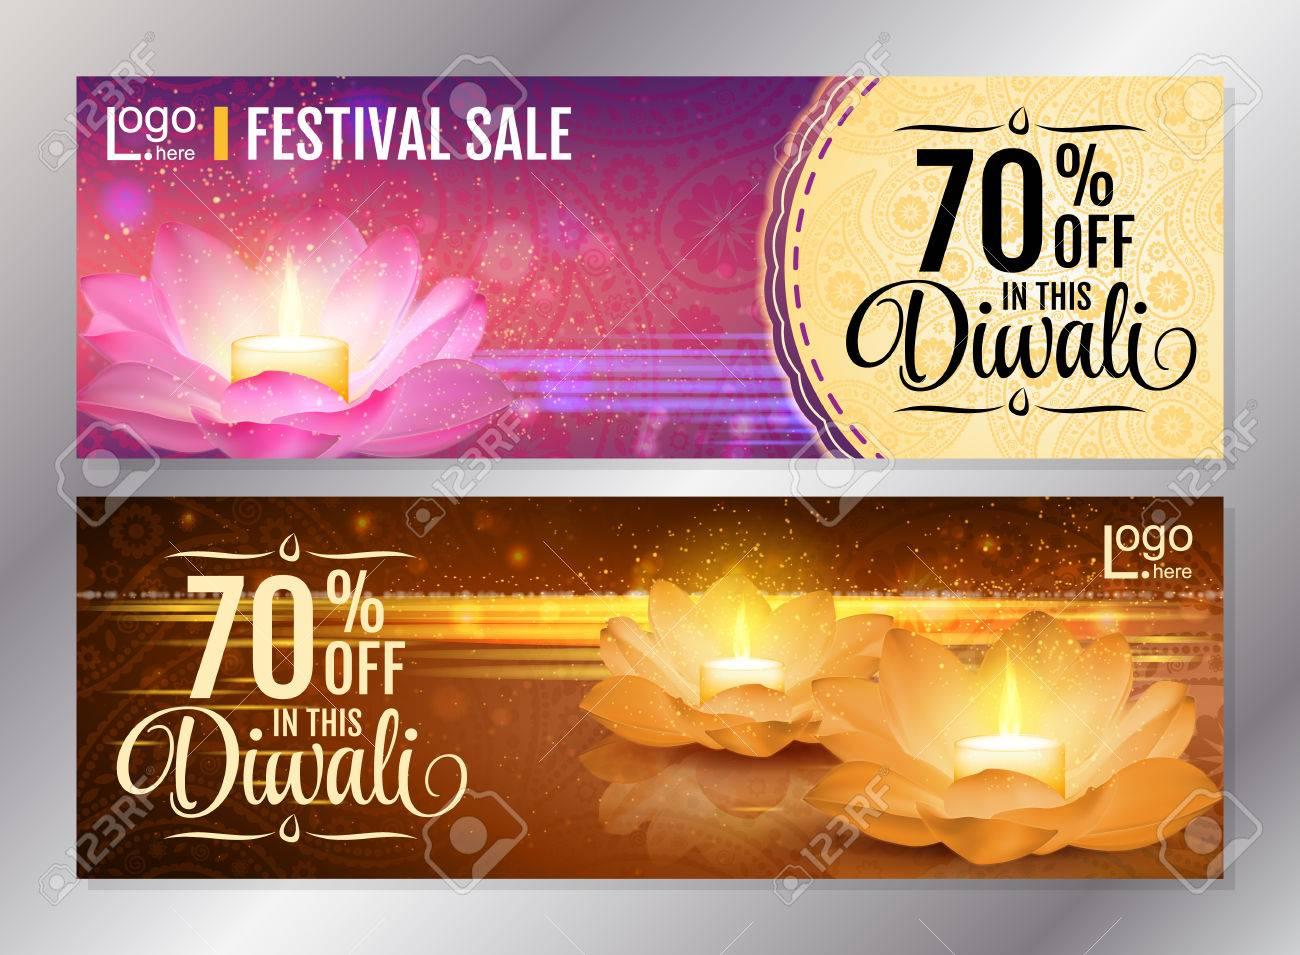 diwali flyer template - Timiz.conceptzmusic.co